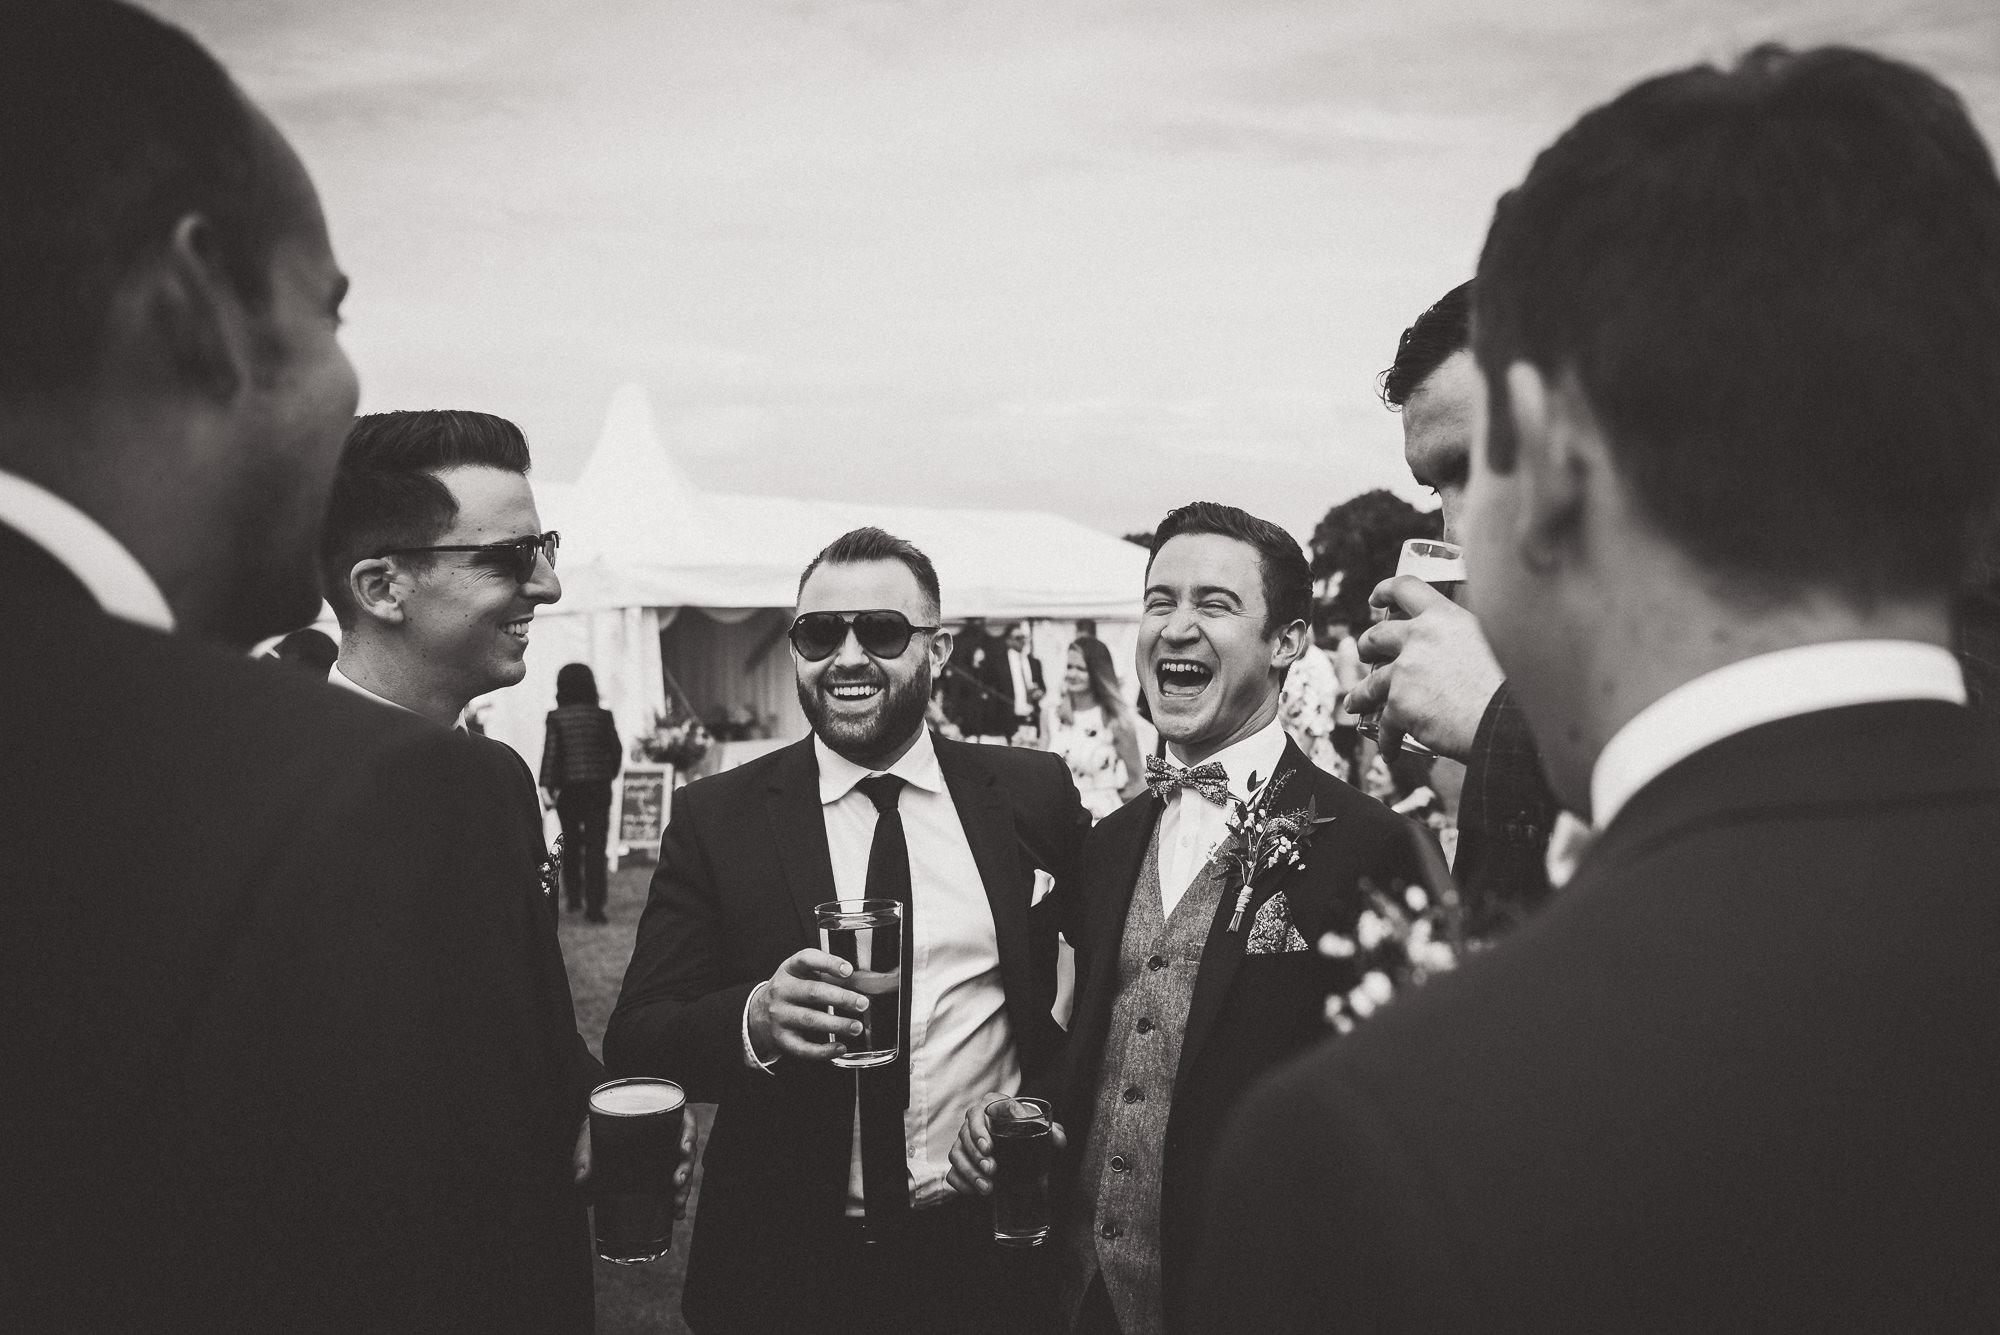 Veils & Bales Wedding Photography | Charlie & Steve SCSS 148